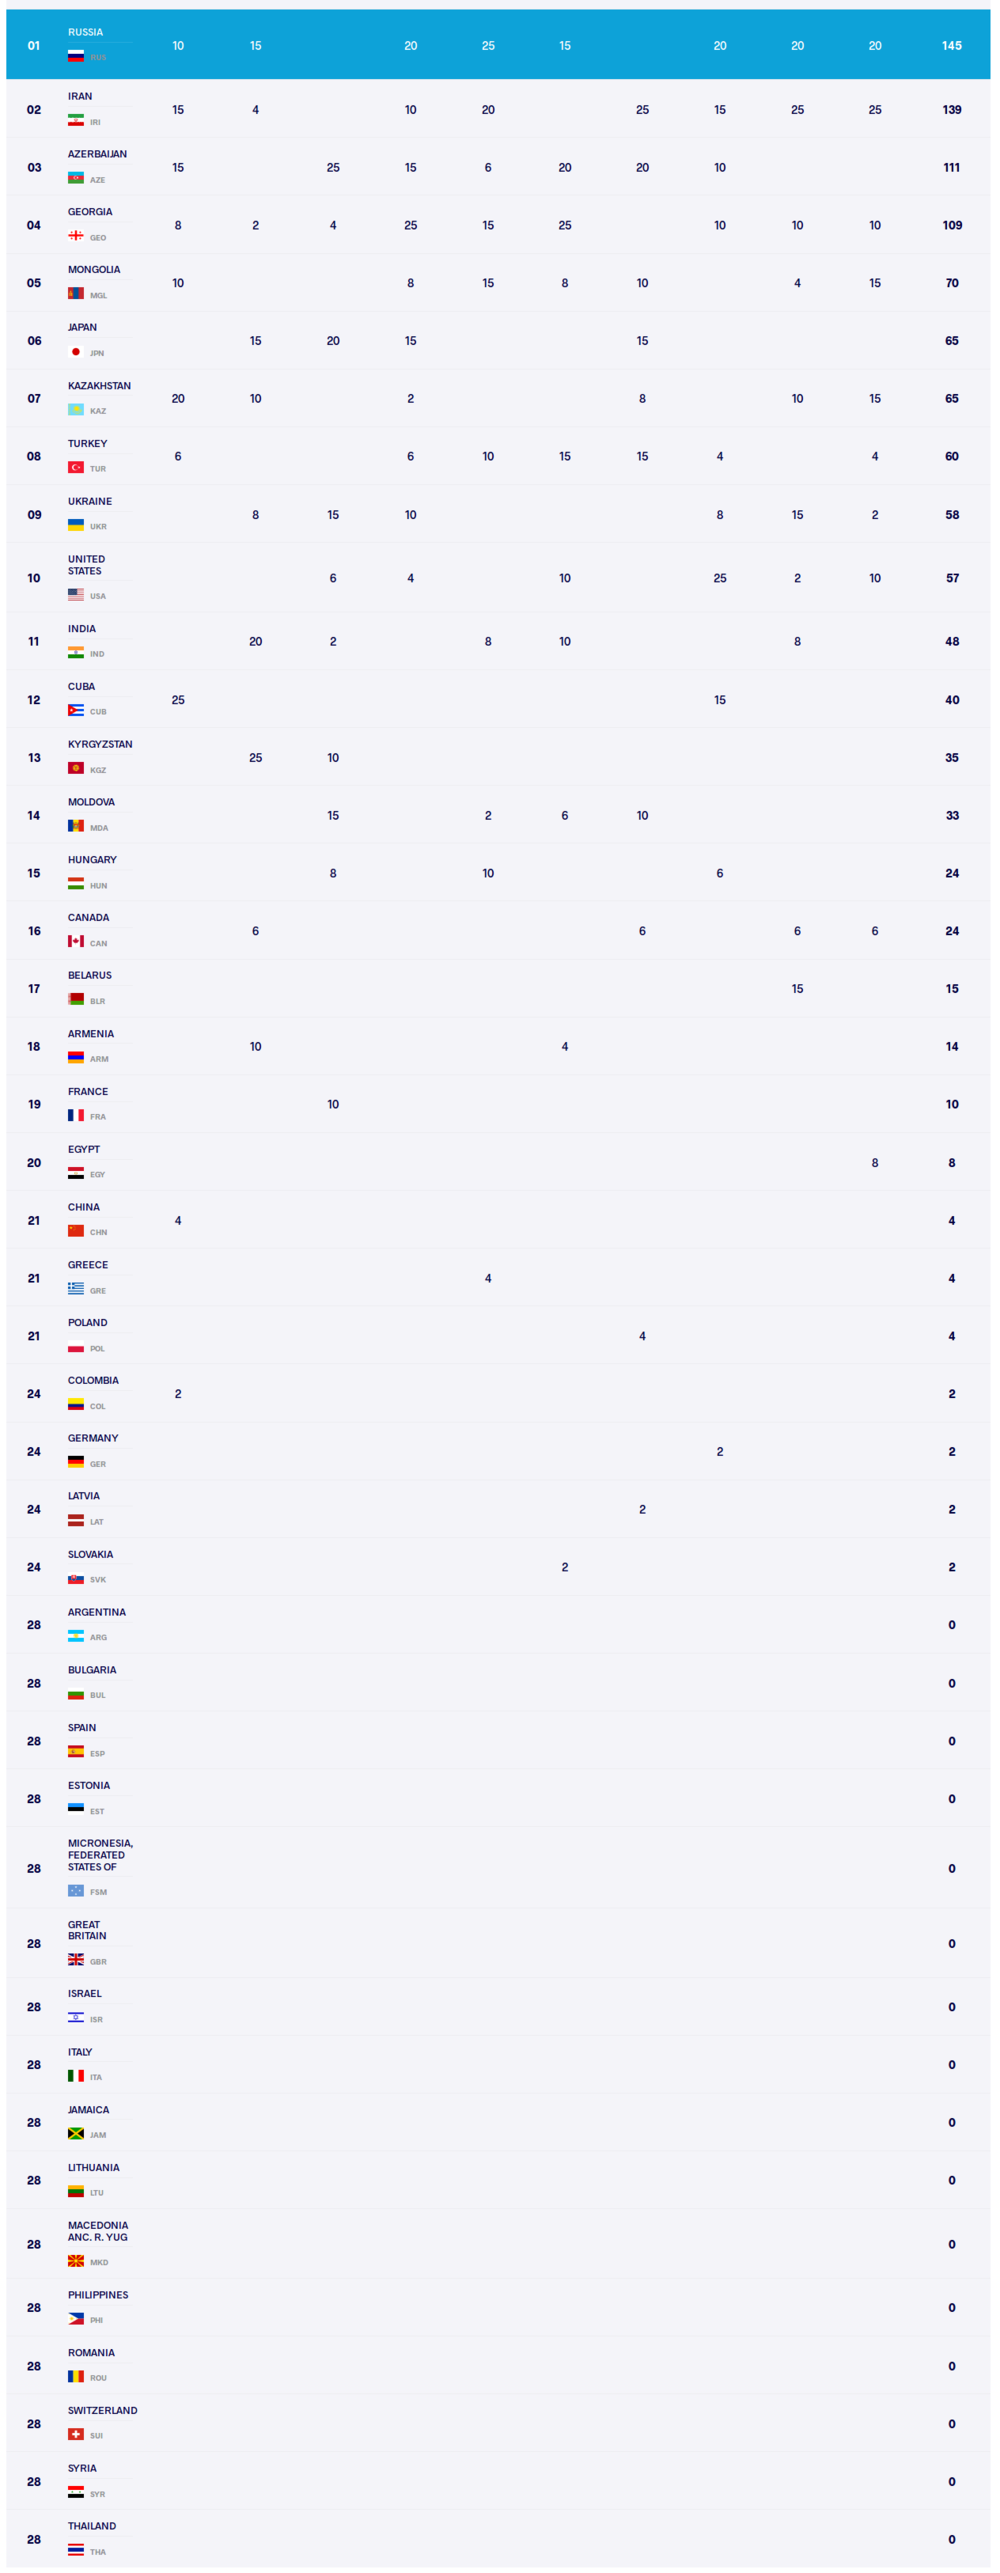 Screenshot_2019-10-31 U23 Senior World Championships United World Wrestling